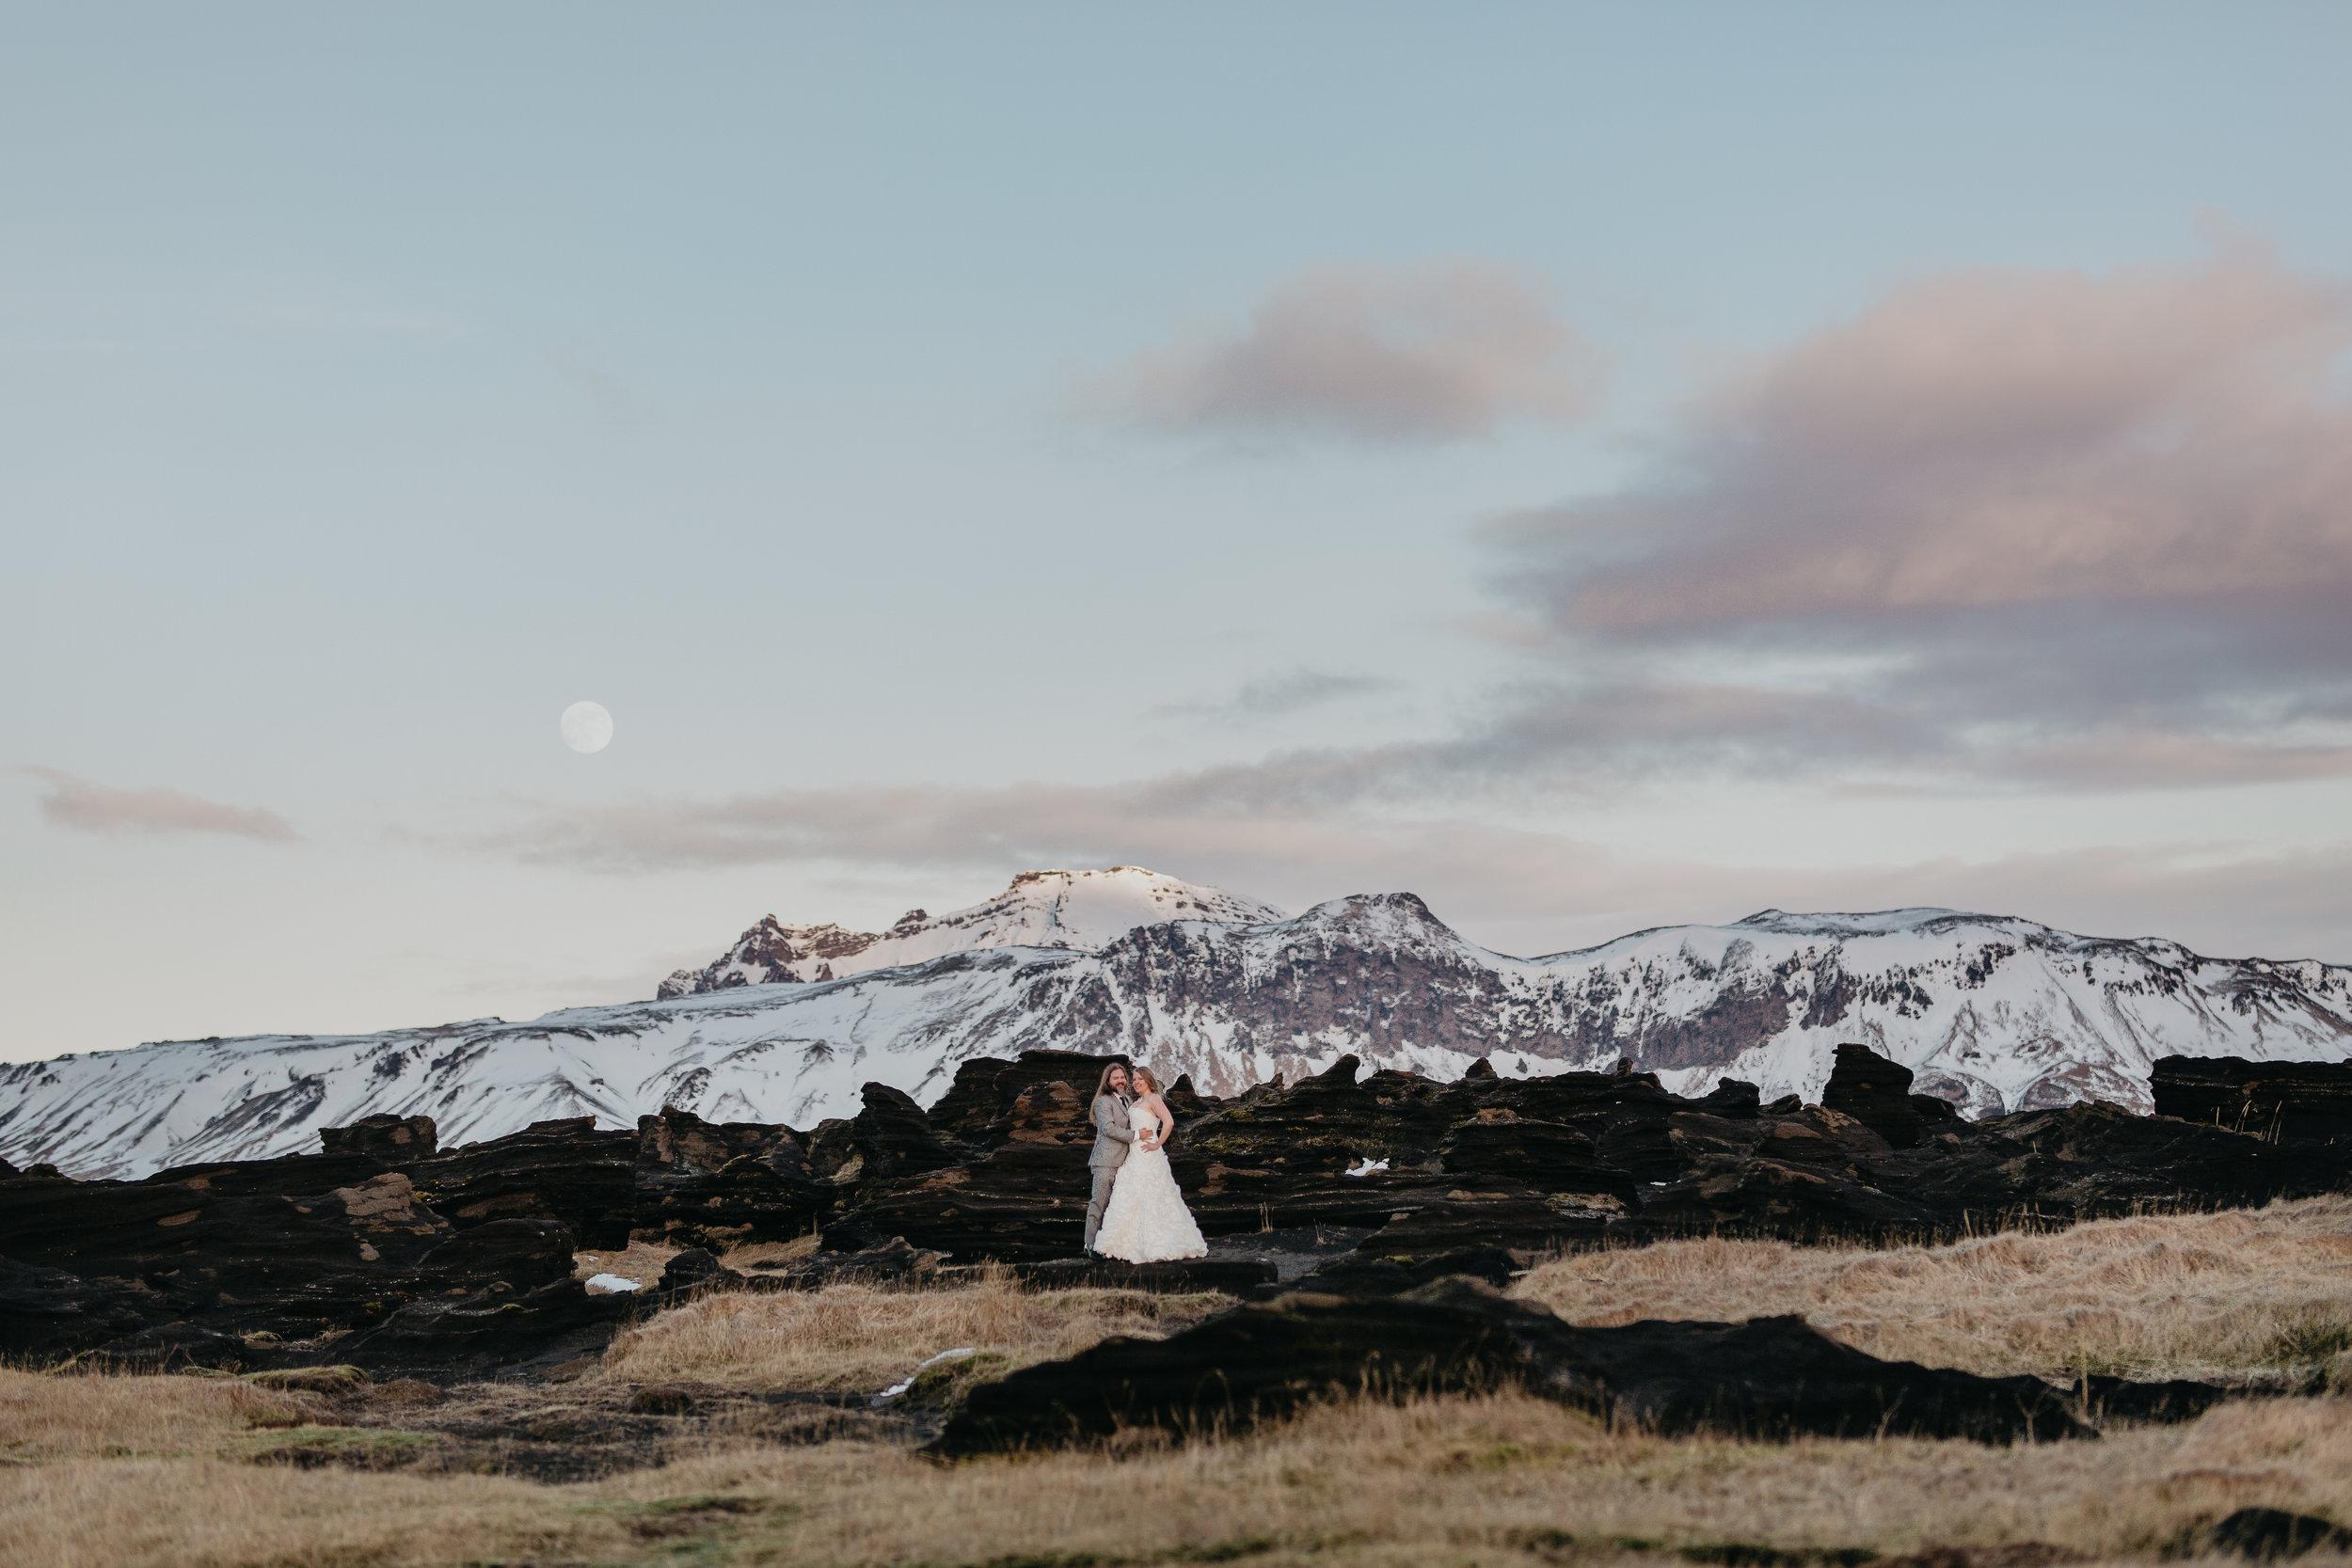 nicole-daacke-photography-iceland-winter-sunset-adventure-elopement-skogafoss-waterfall-black-sand-beach-dyrholaey-vik-iceland-intimate-wedding-black-church-elopement-photographer-25.jpg